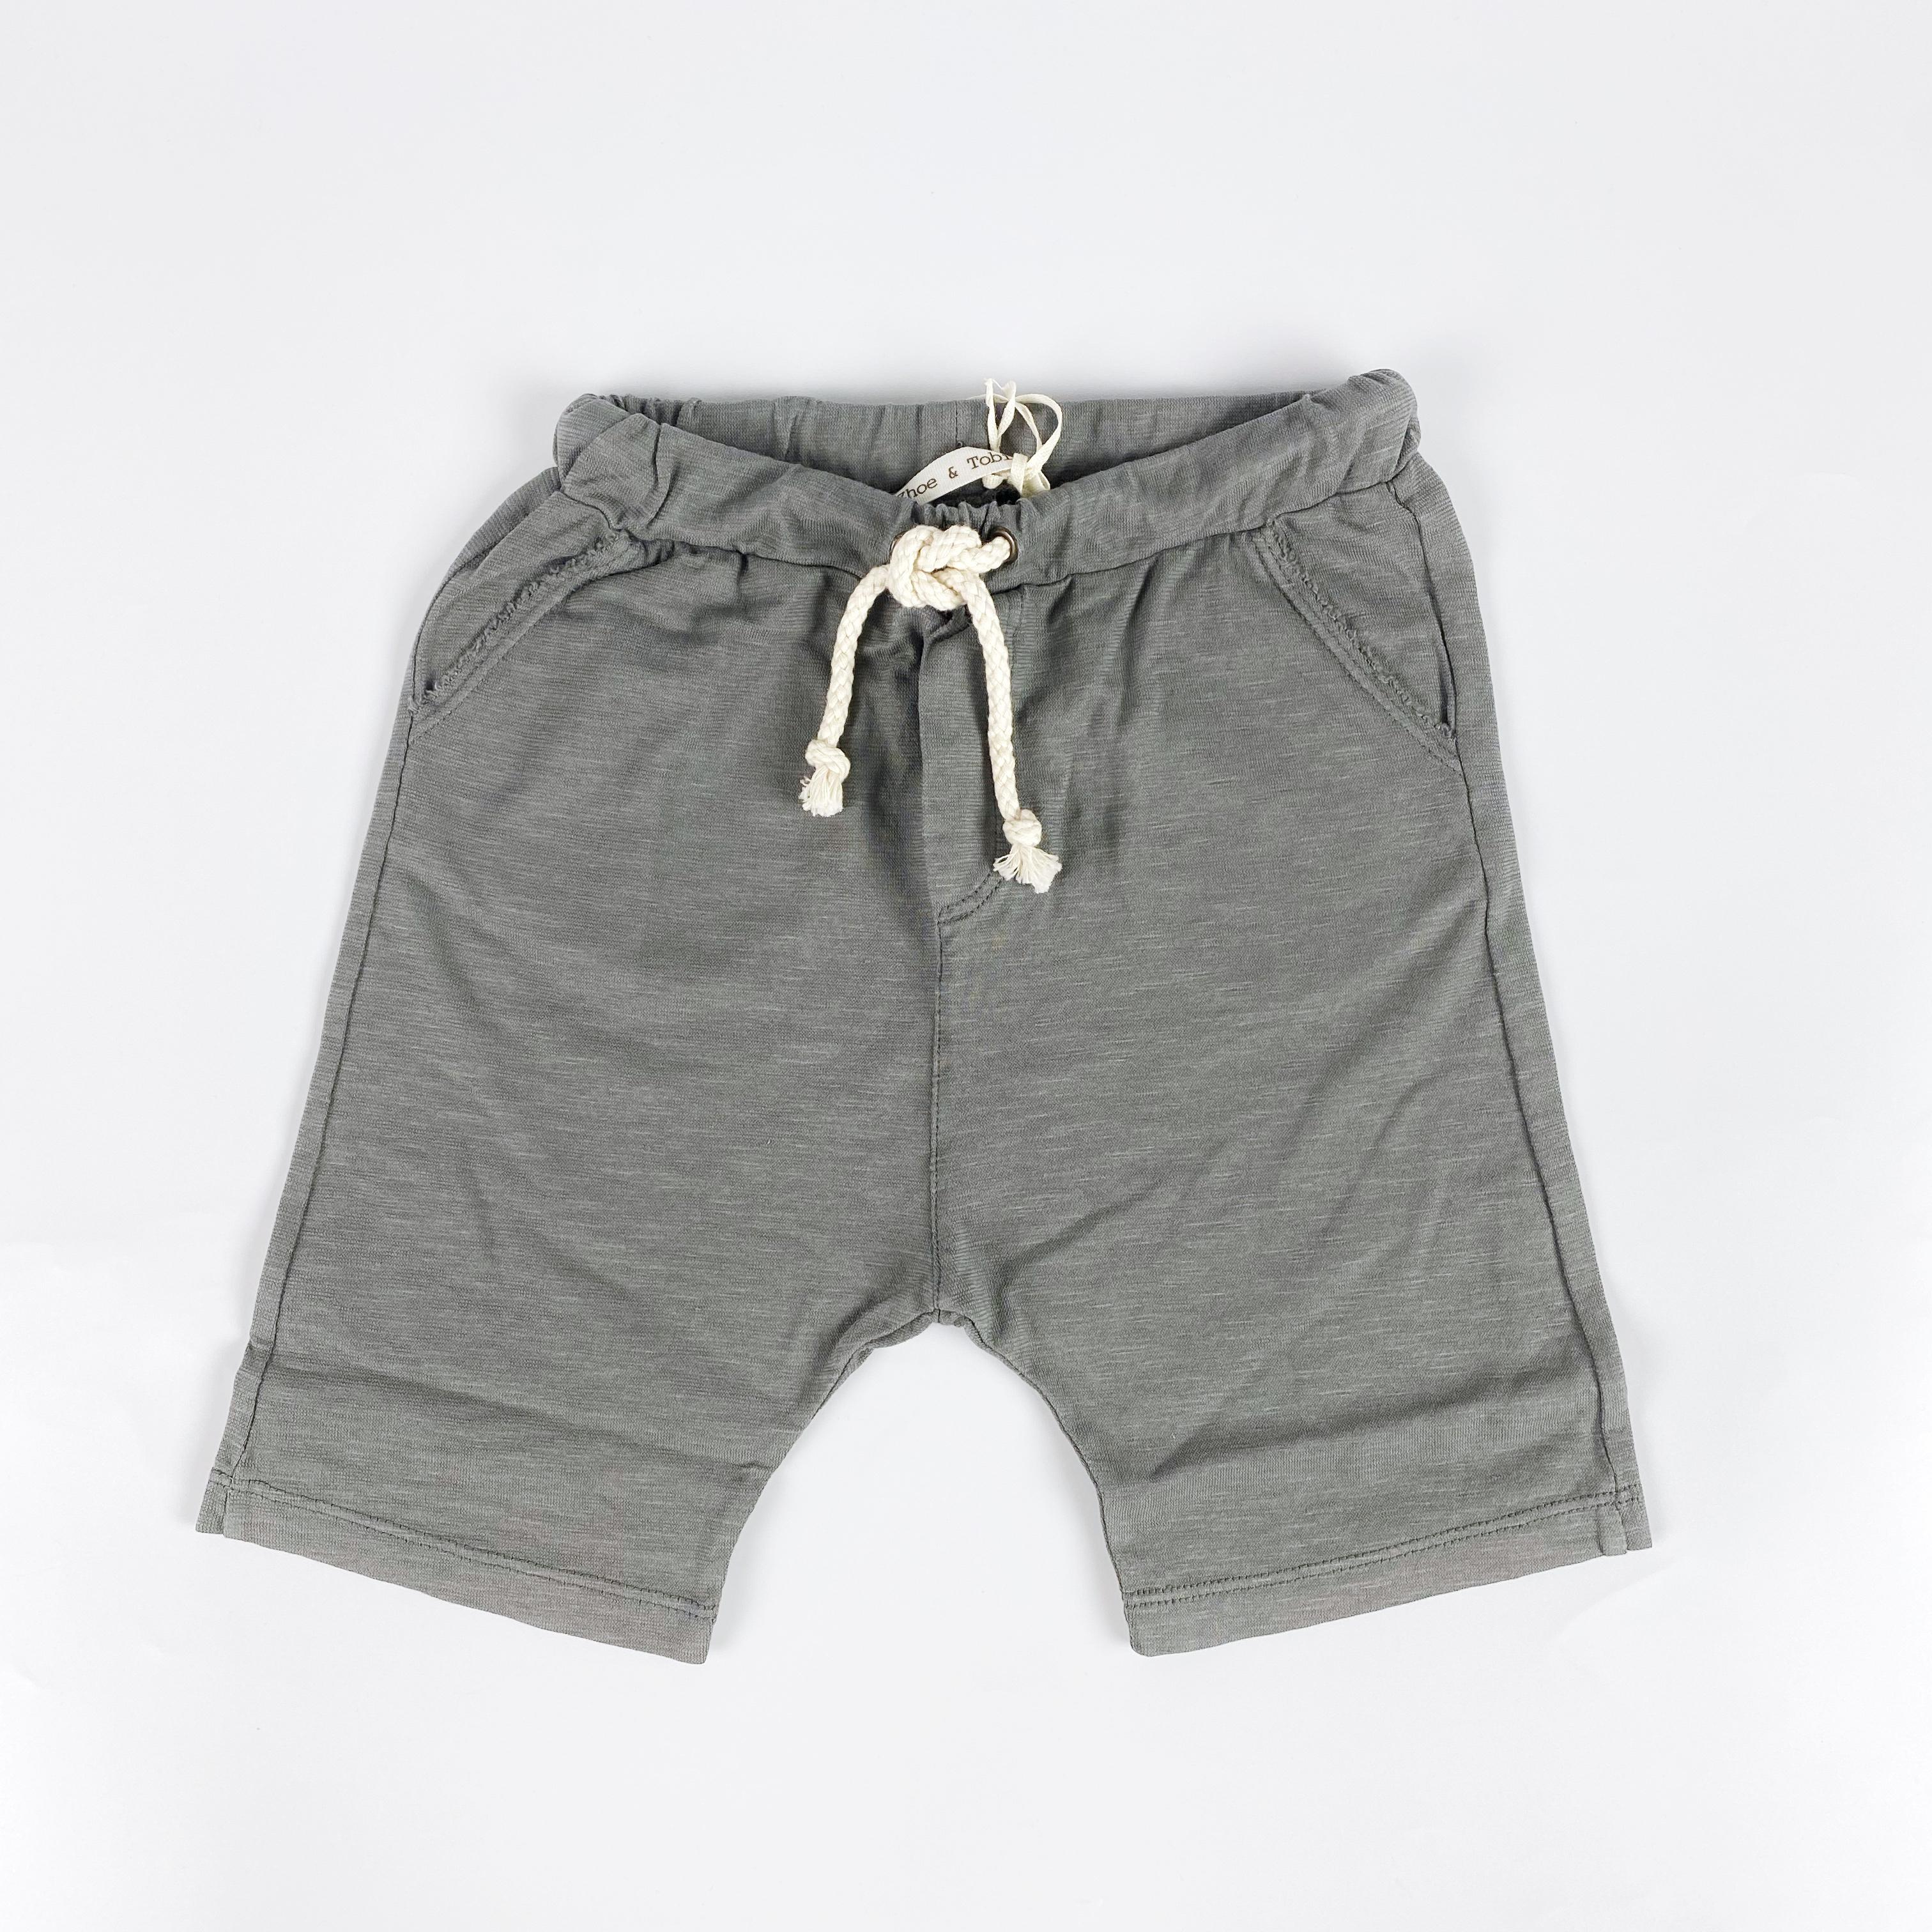 pantaloncino in felpa